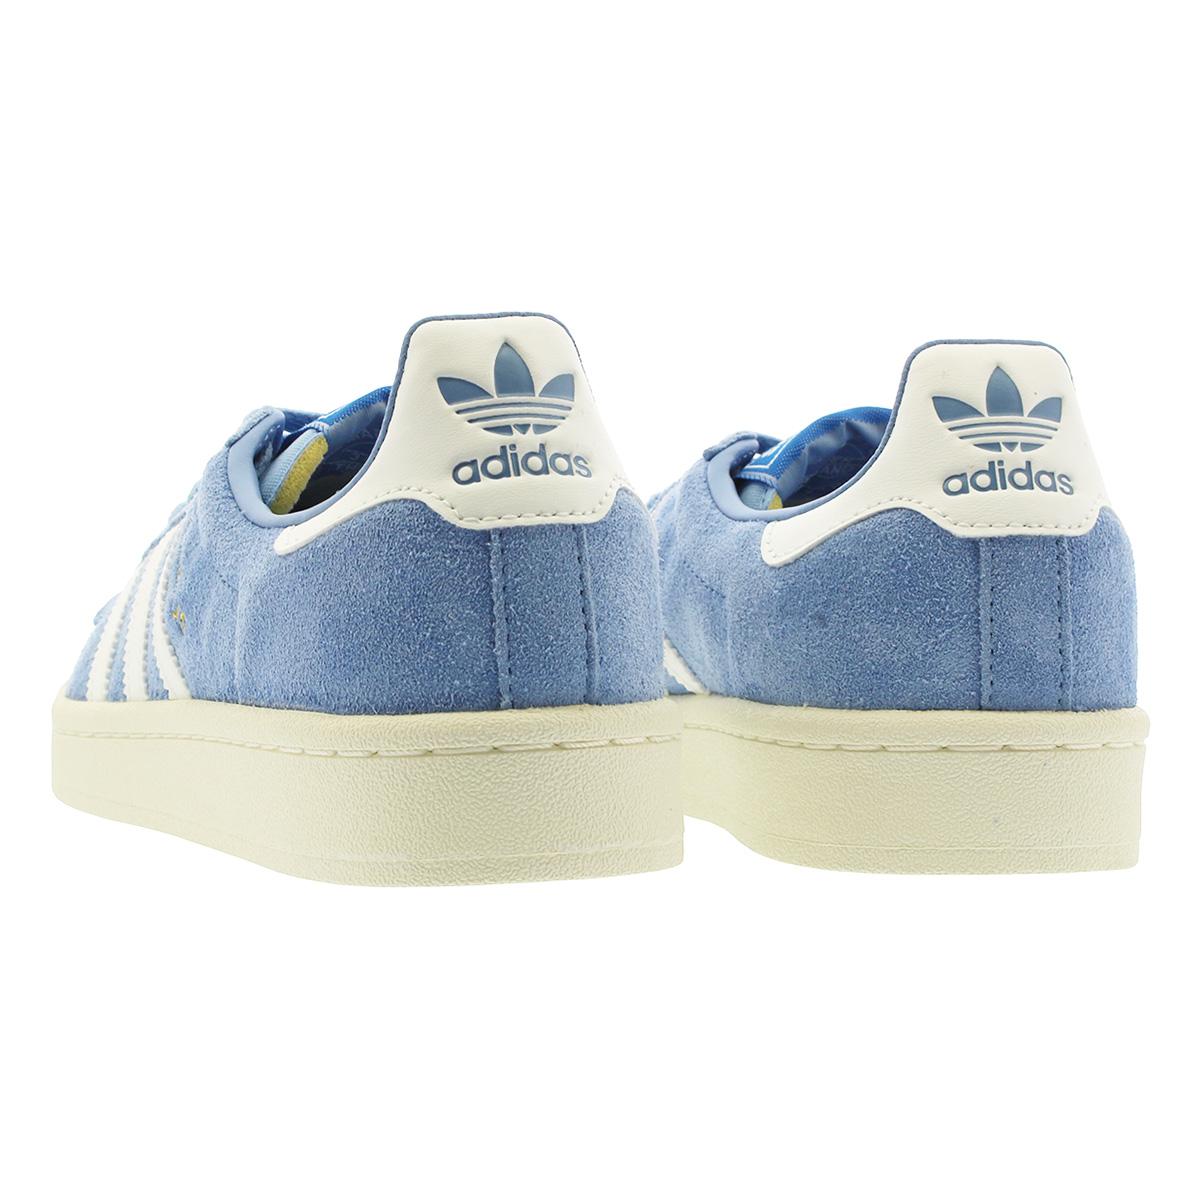 premium selection b2fe3 5ef22 adidas CAMPUS W Adidas women campus ASH BLUE CLOUD WHITE CREAM WHITE b37936